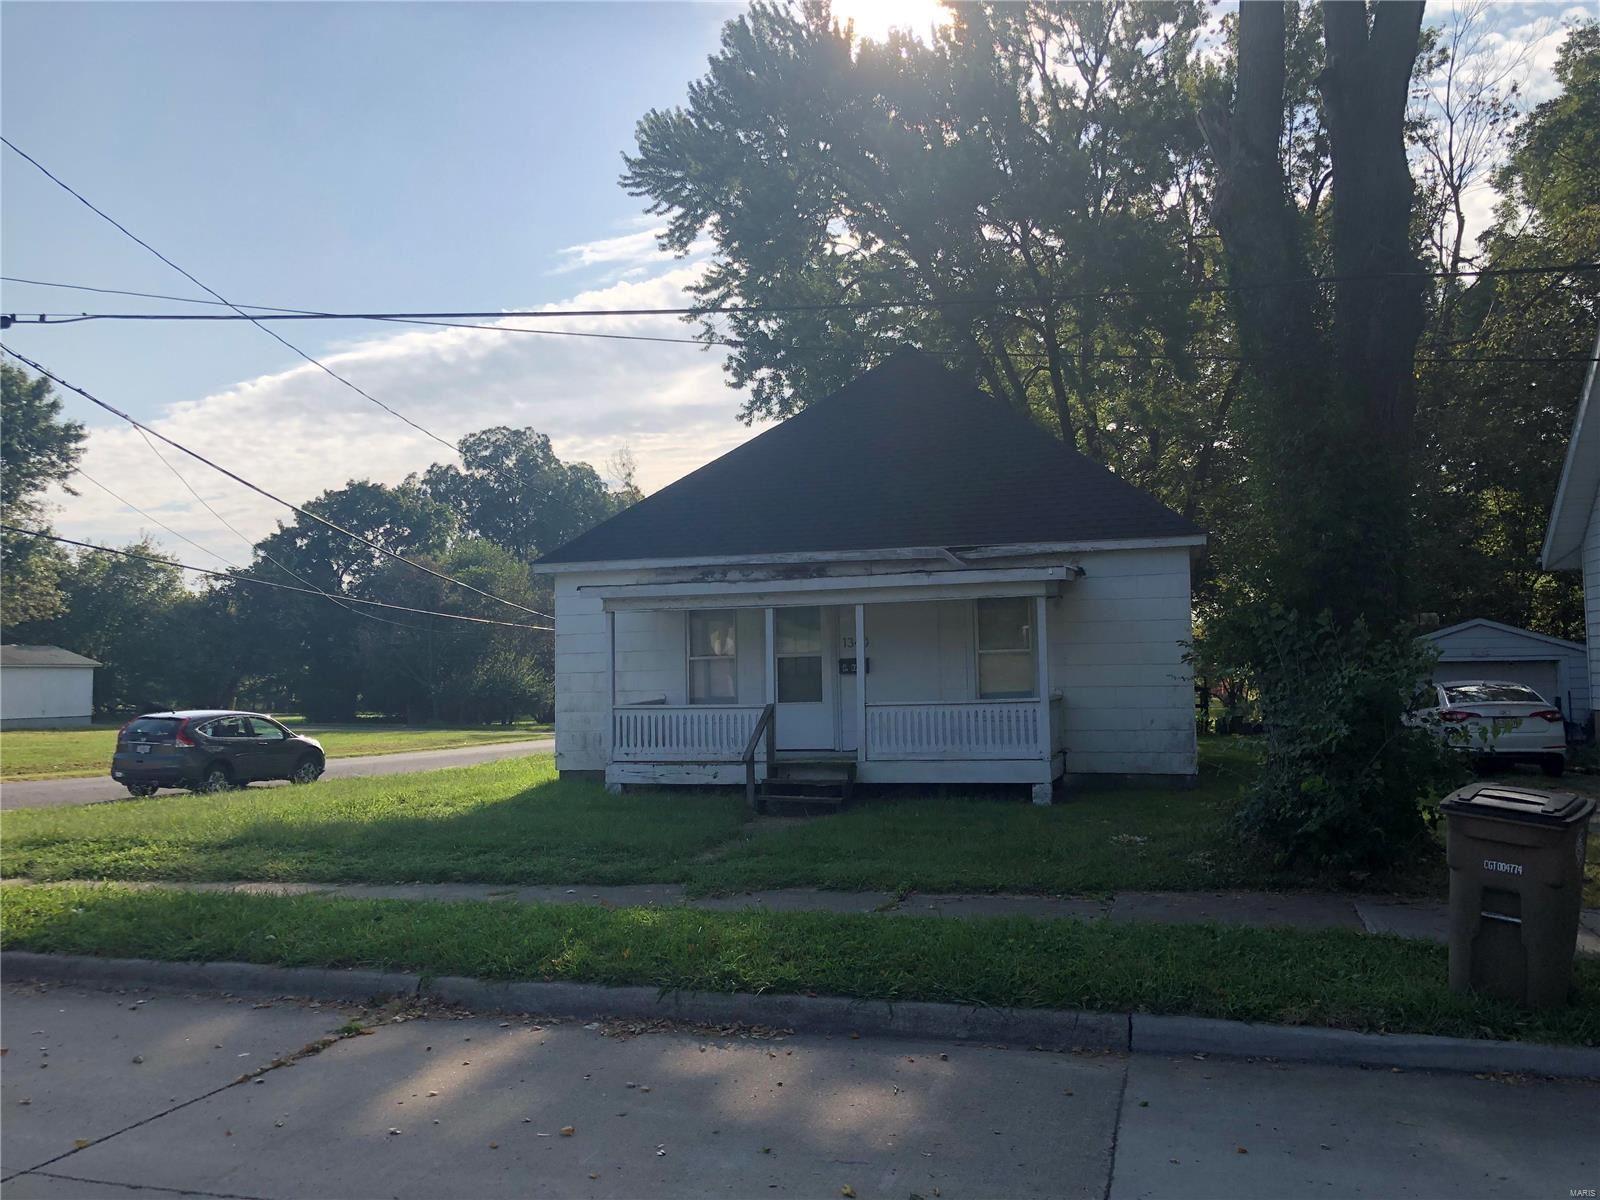 Photo of 1340 N Main Street, Cape Girardeau, MO 63701 (MLS # 21065758)